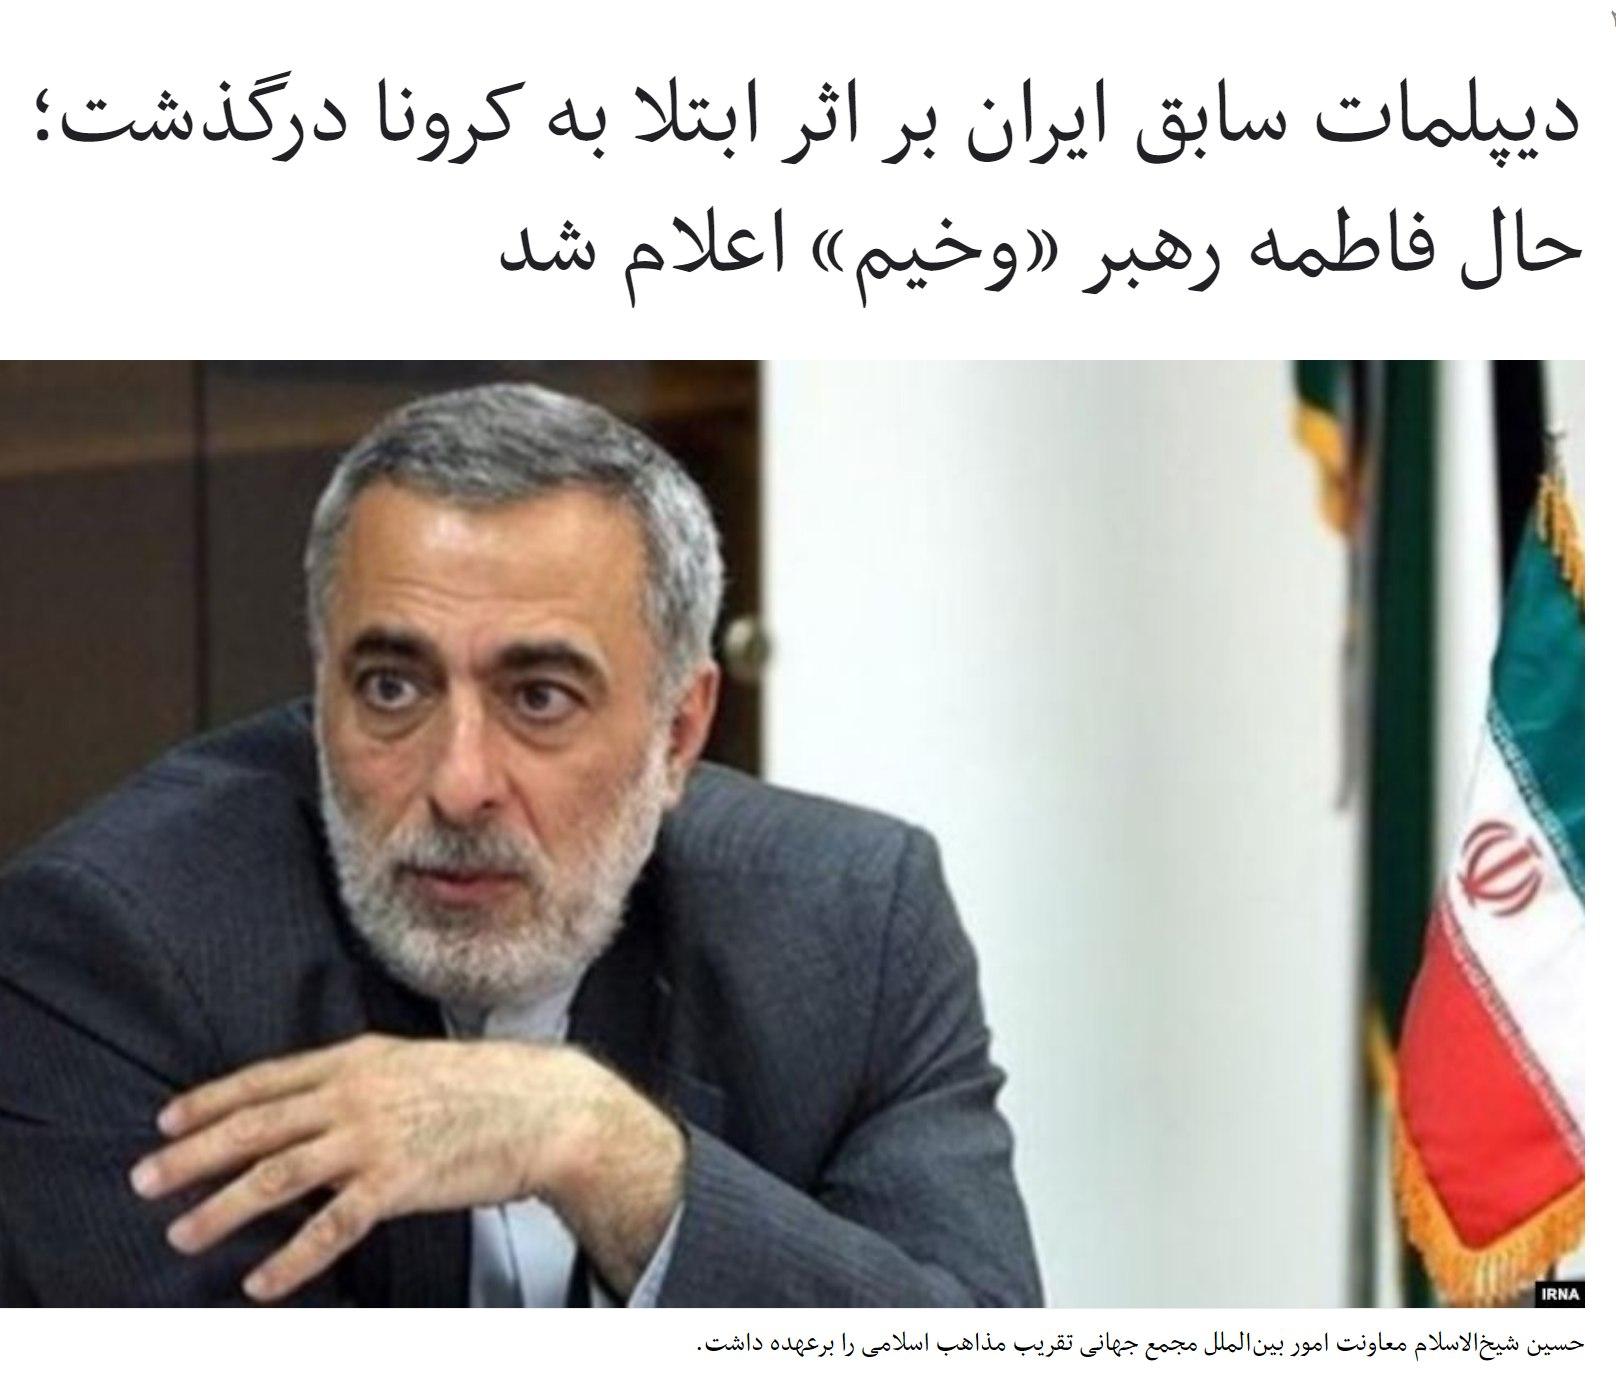 حسین شیخالاسلام، دیپلمات و م … 206026001583439606